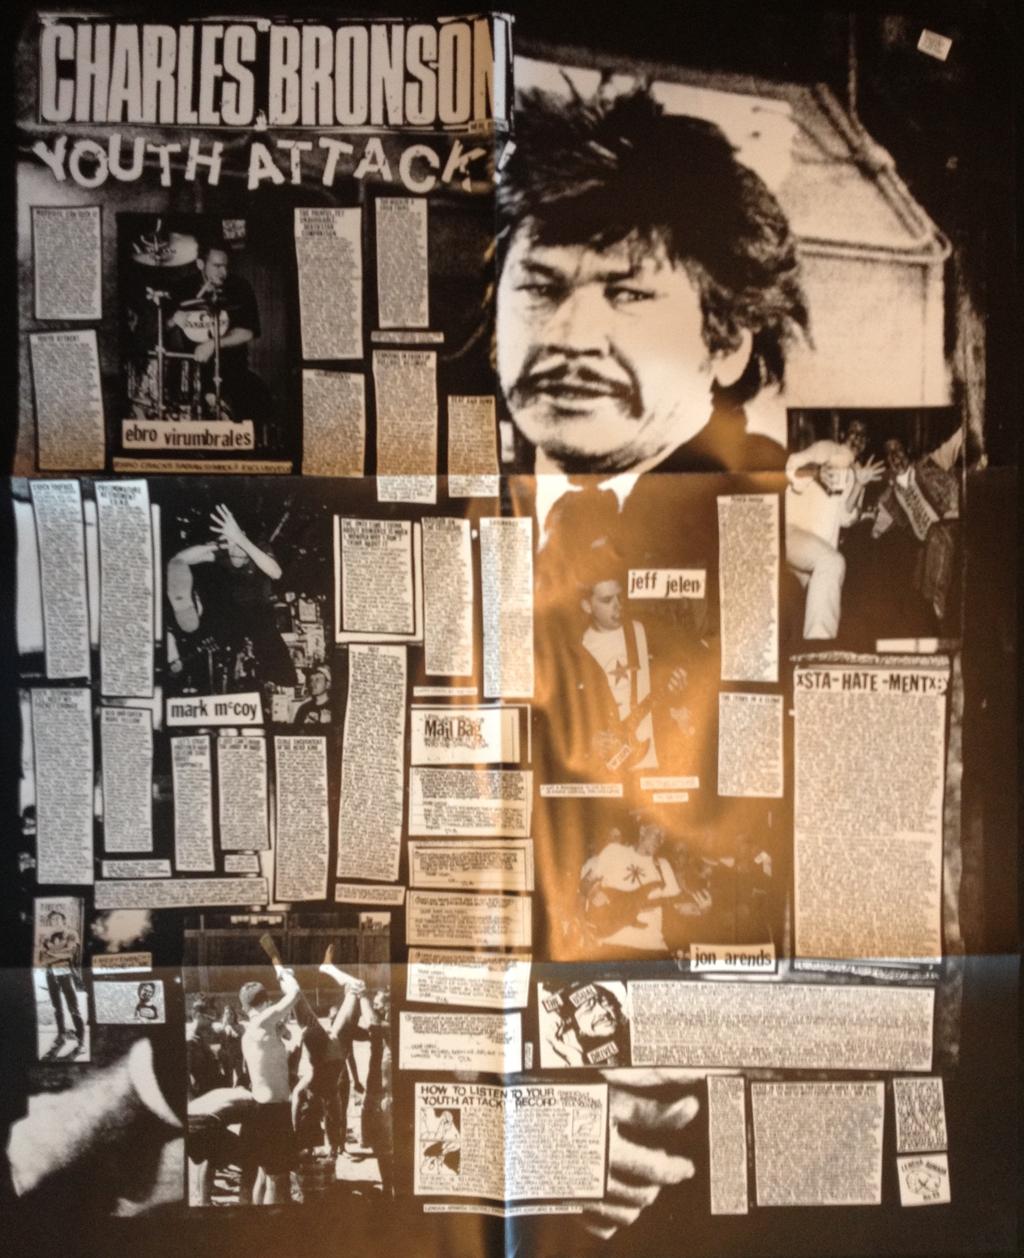 Charles Bronson Youth Attack 1997 Swedish Punk